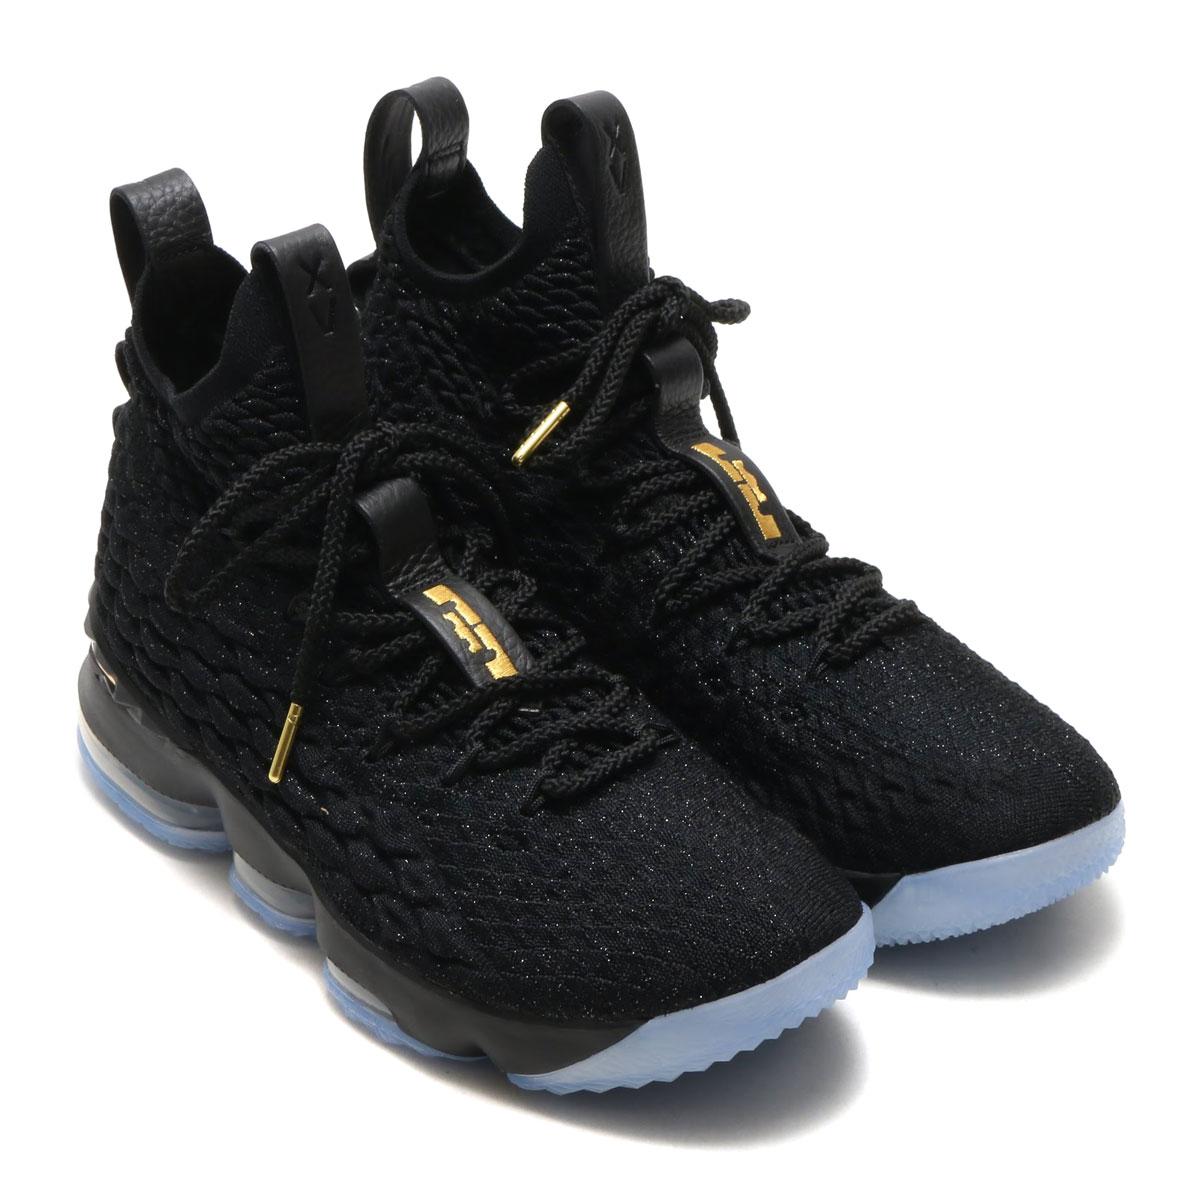 8fe0ae9ef133 NIKE LEBRON XV EP (Nike Revlon 15 EP) (BLACK METALLIC GOLD-BLACK) 18SP-S